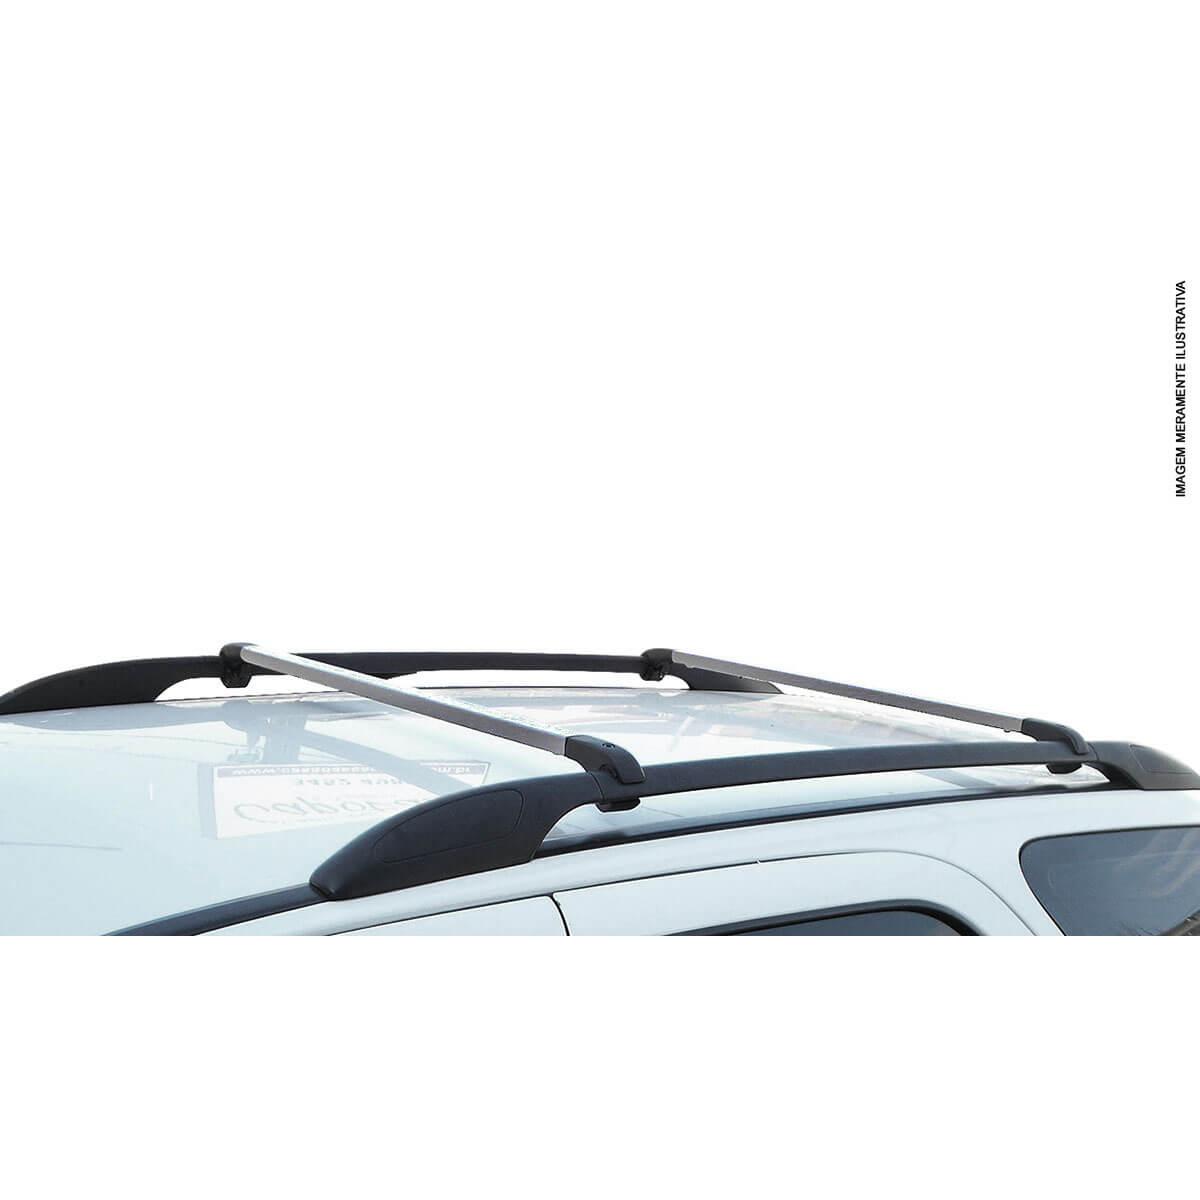 Travessa rack de teto alumínio UP! Cross VW up 2014 a 2021